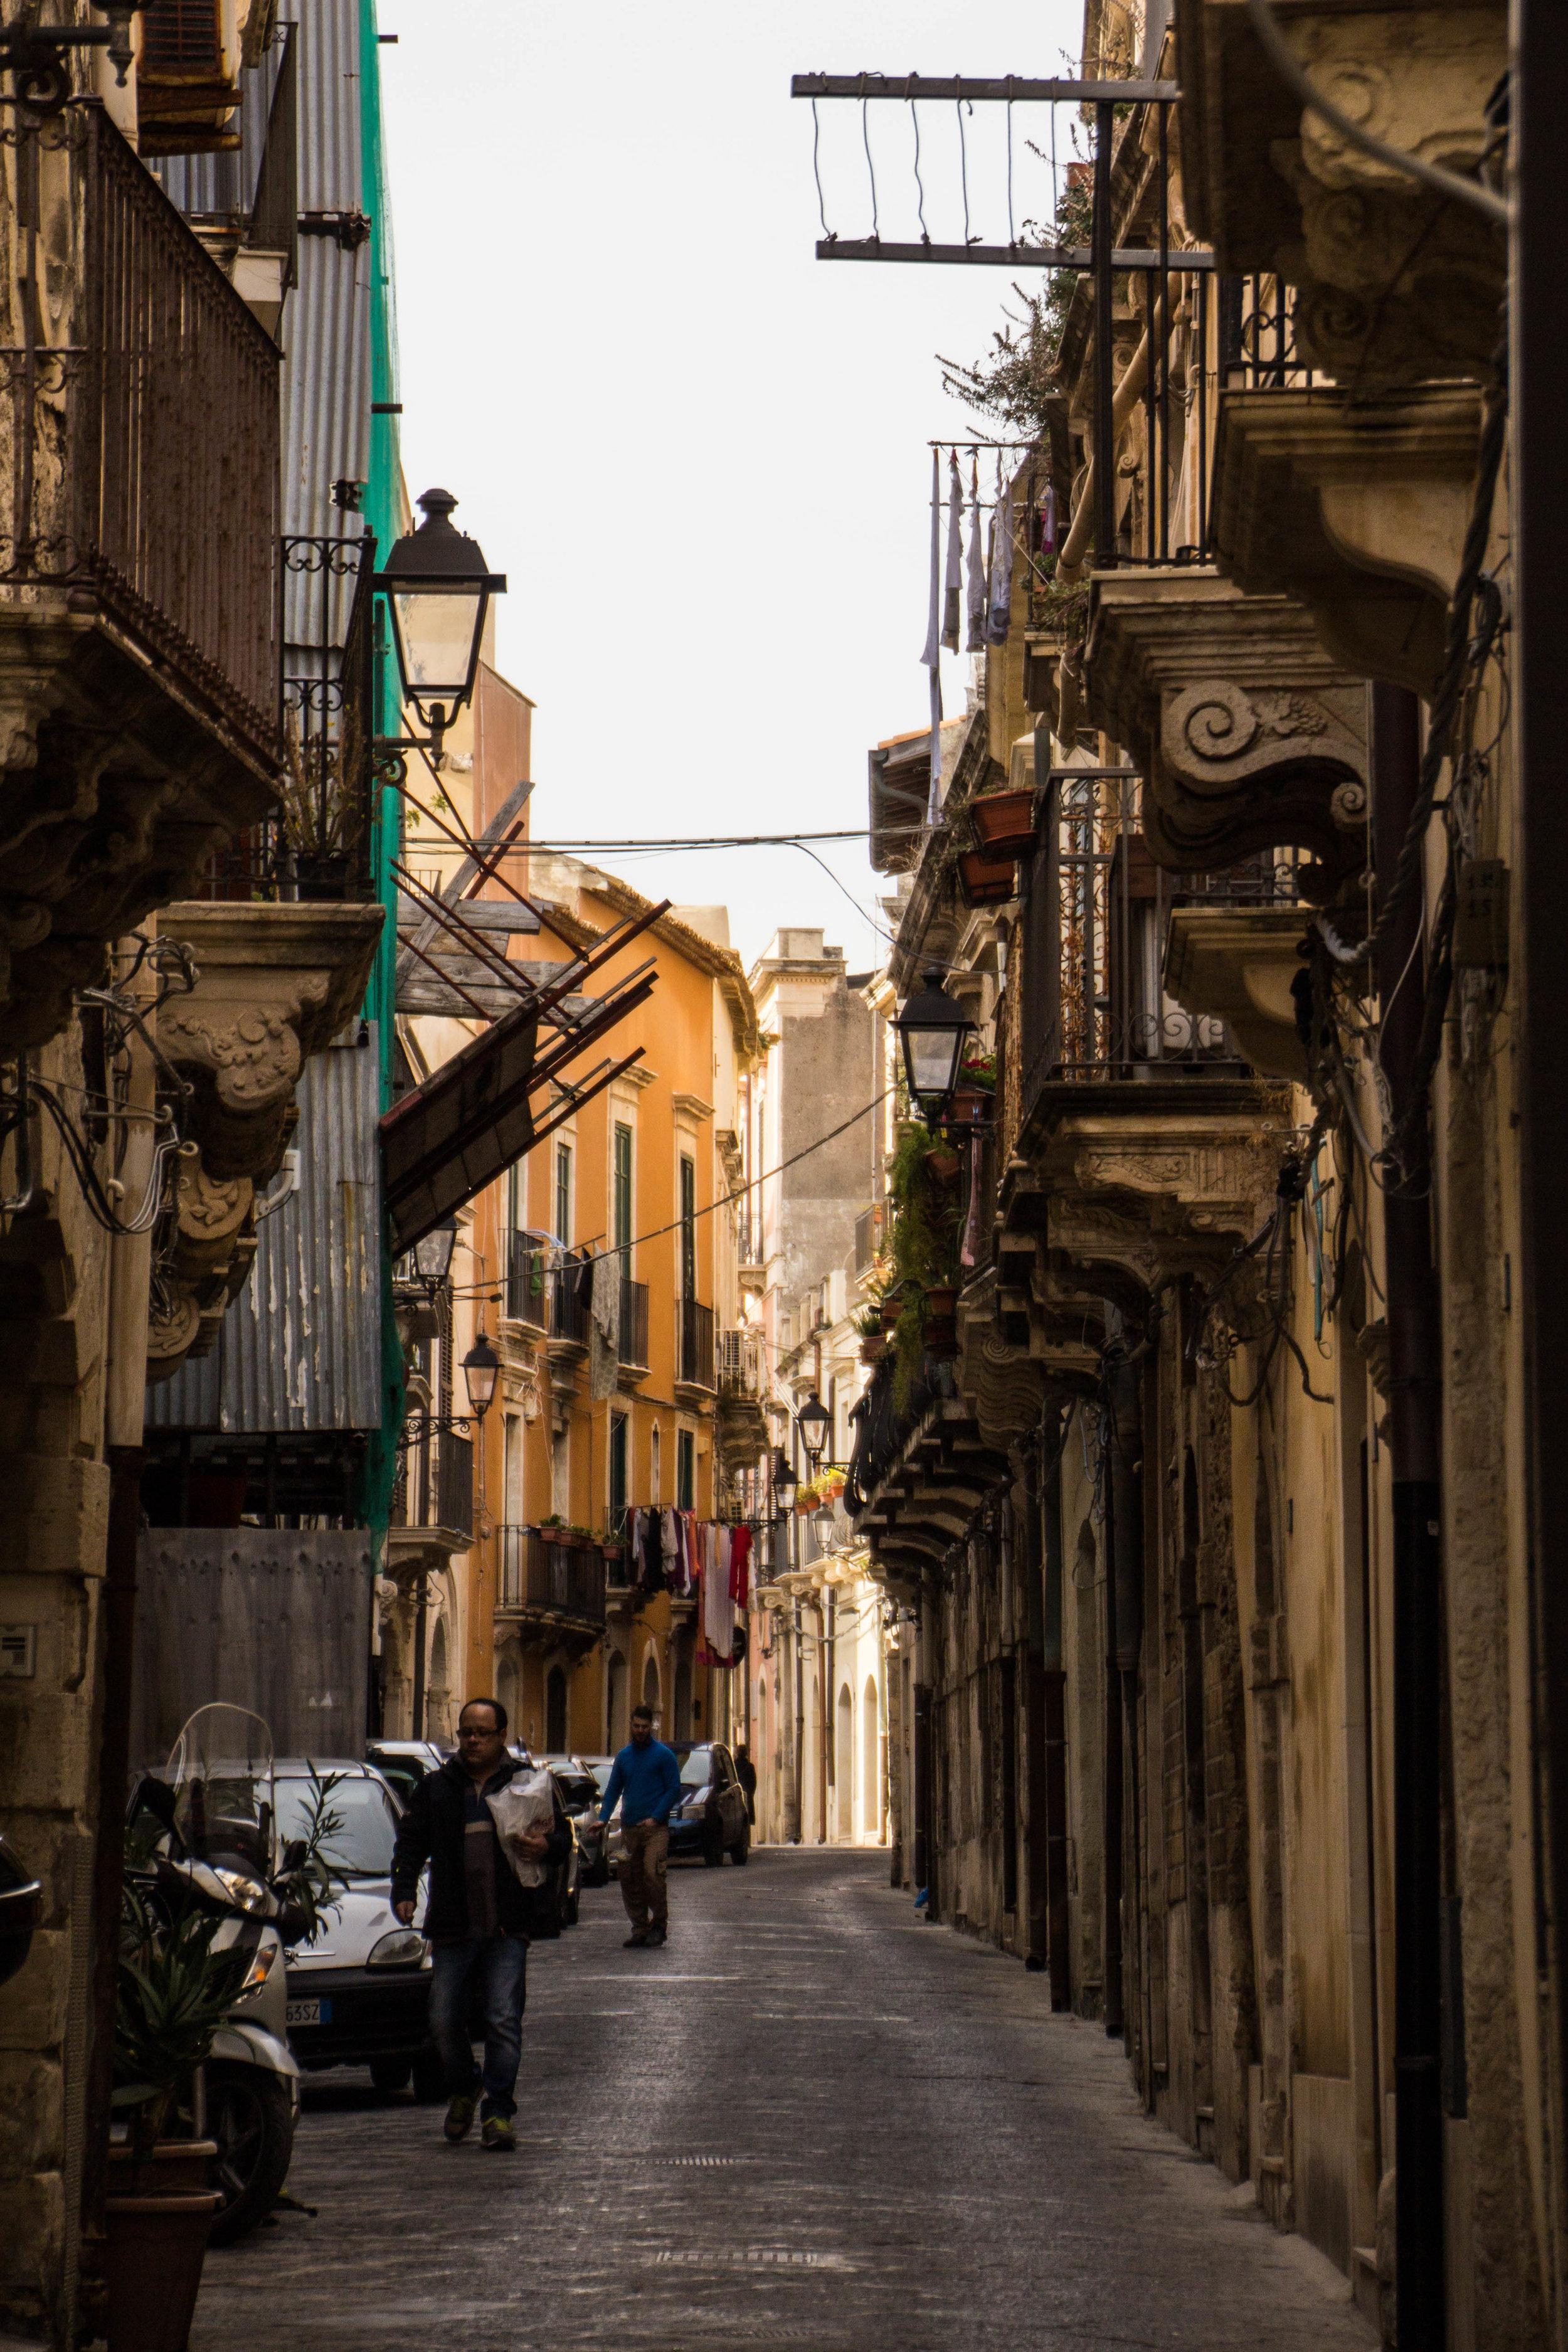 streets-ortygia-syracuse-sicily-34.jpg